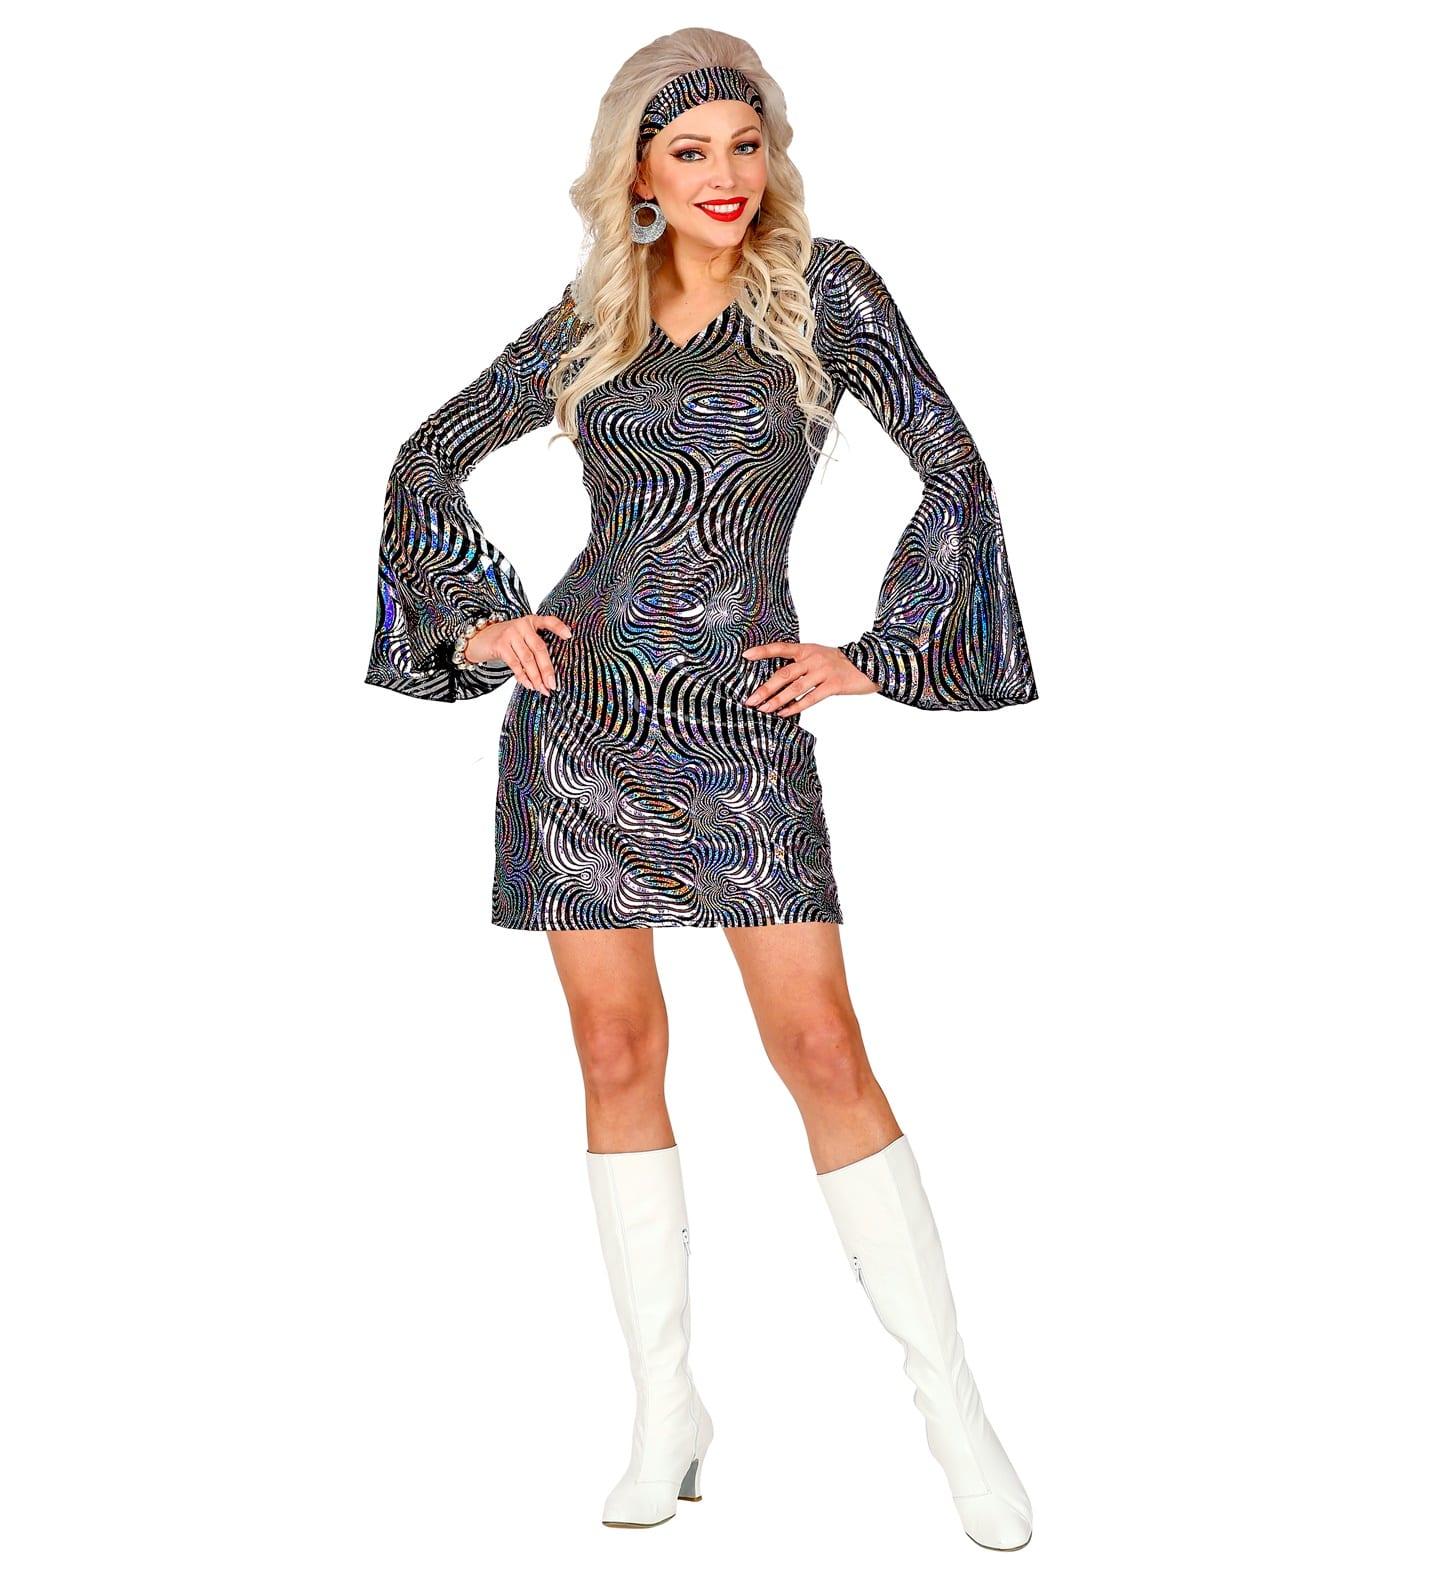 70-tals discoklänning L